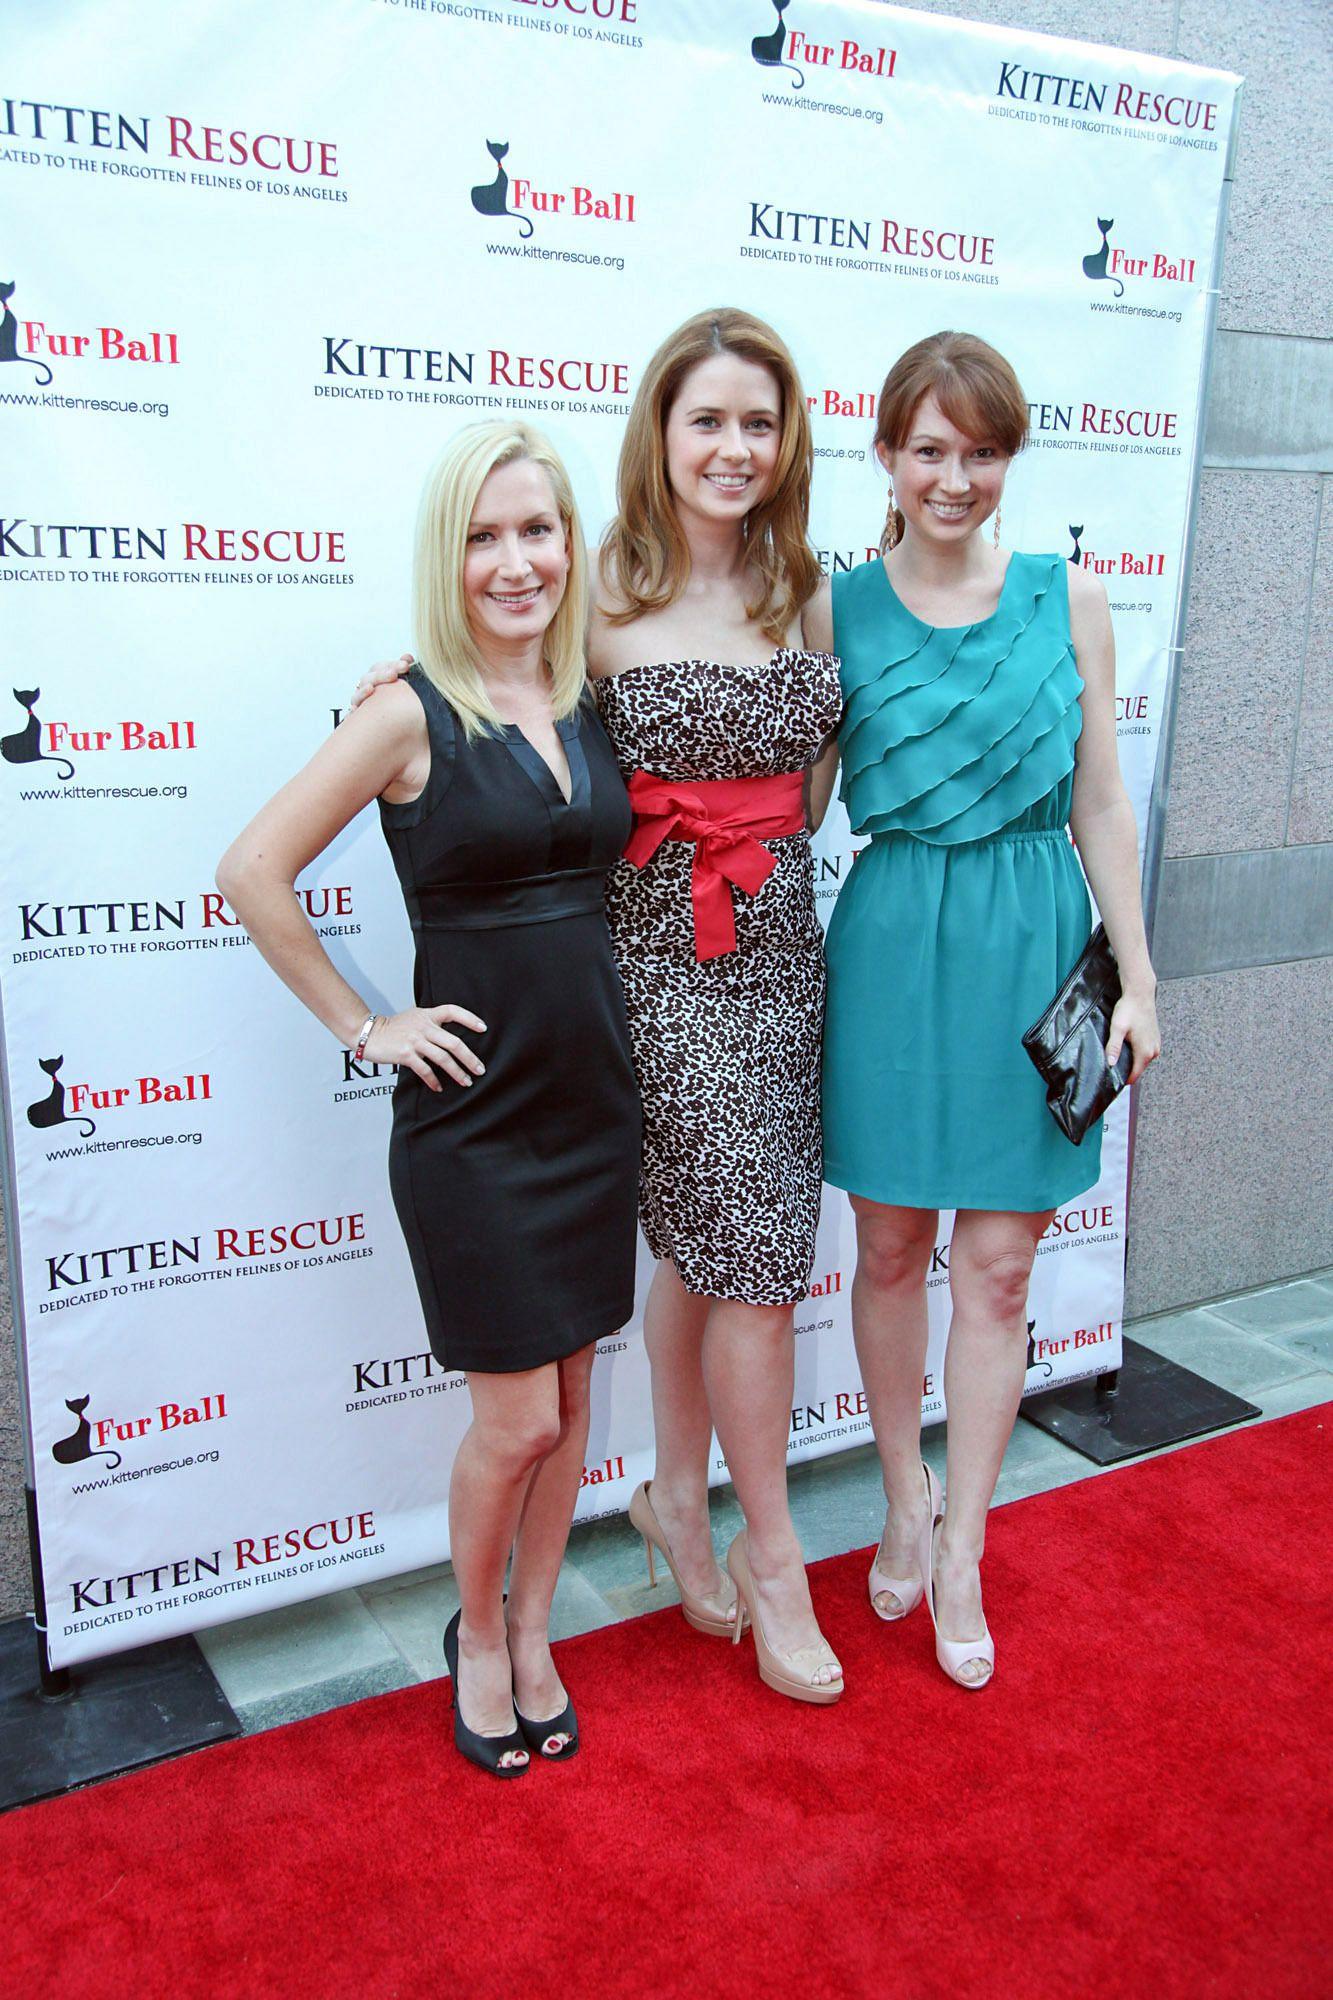 Ellie Kemper Office Red Dress